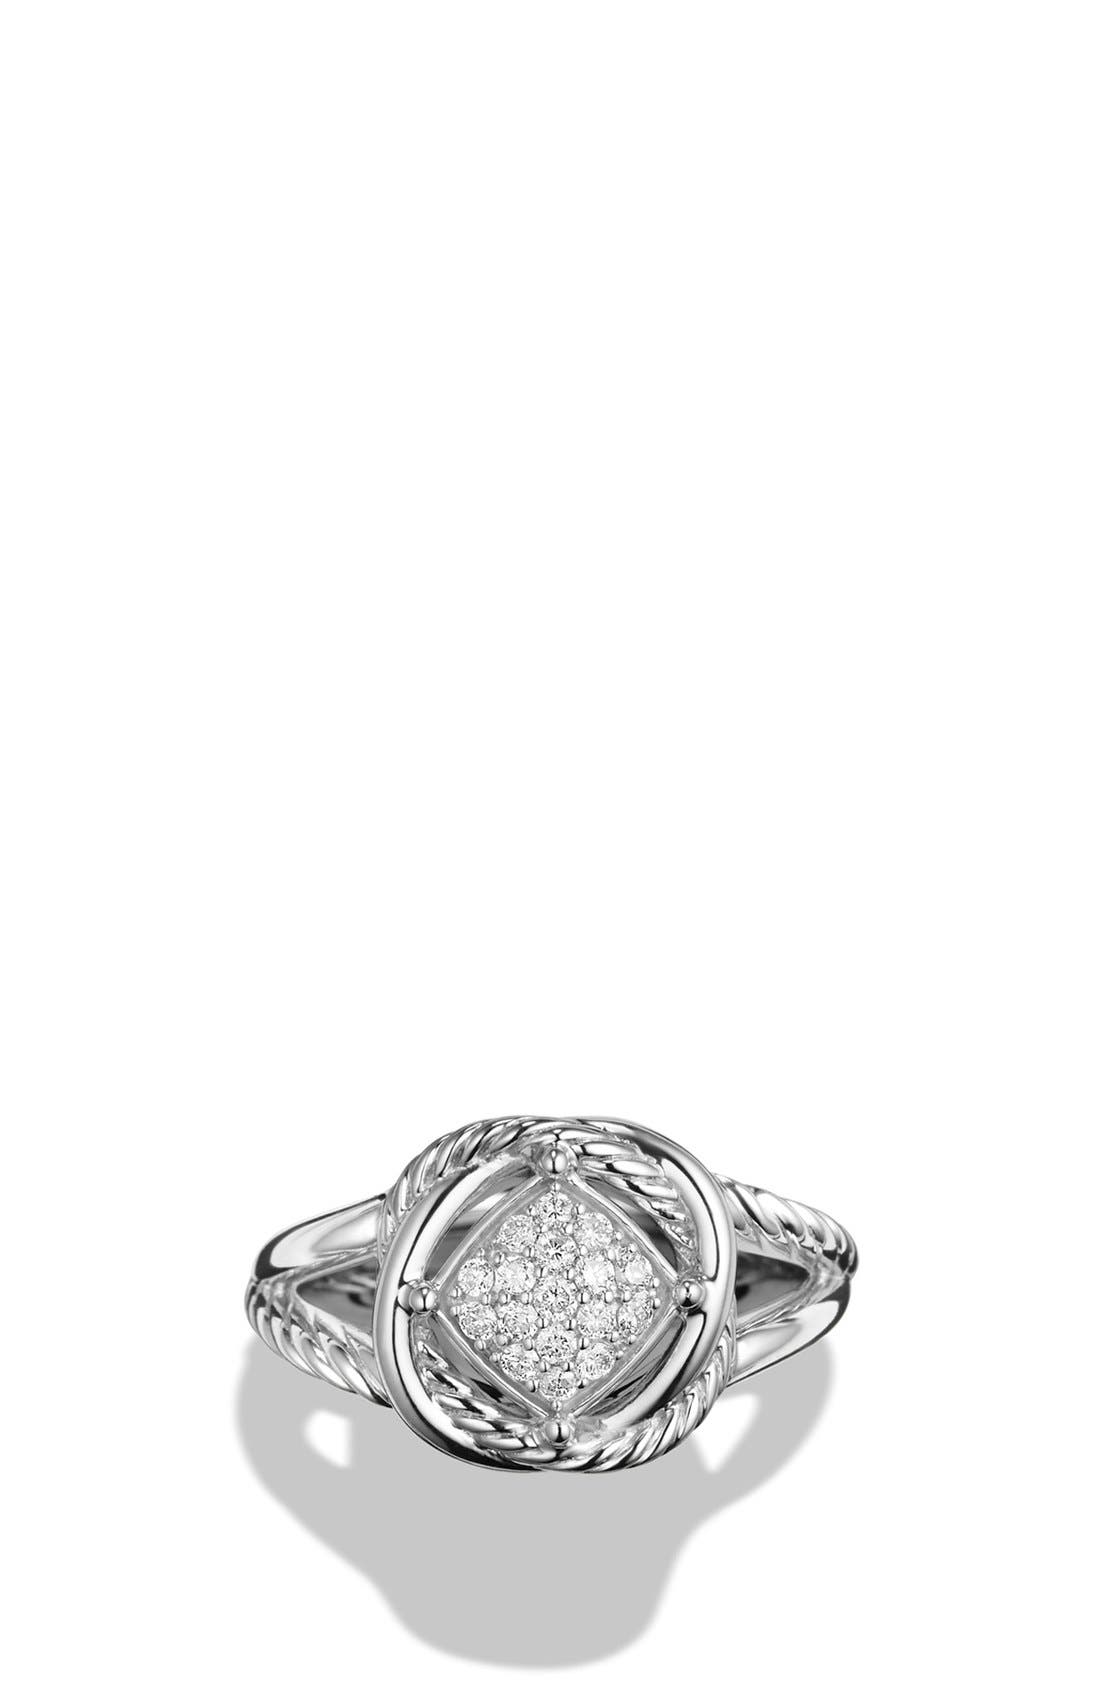 Main Image - David Yurman'Infinity' Ring with Diamonds